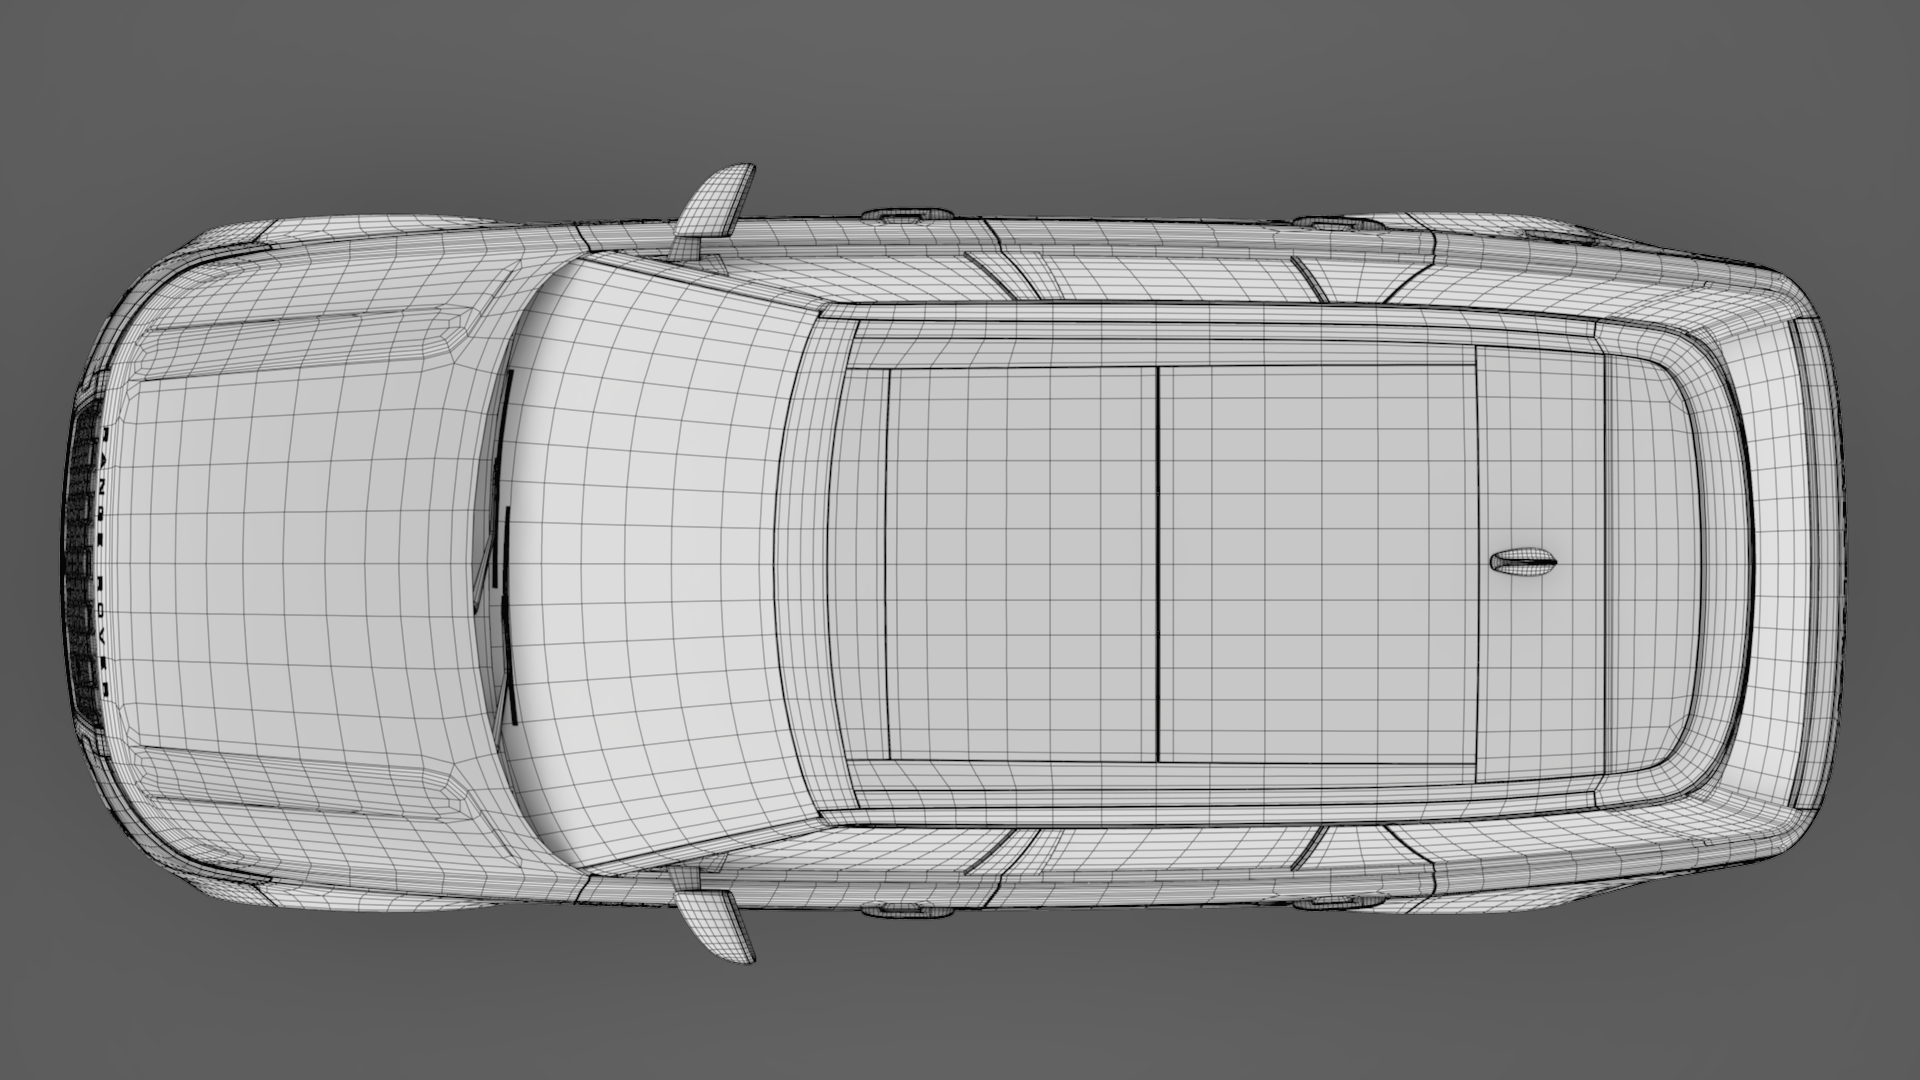 range rover vogue lwb l405 2018 3d model max fbx c4d lwo ma mb hrc xsi obj 277541